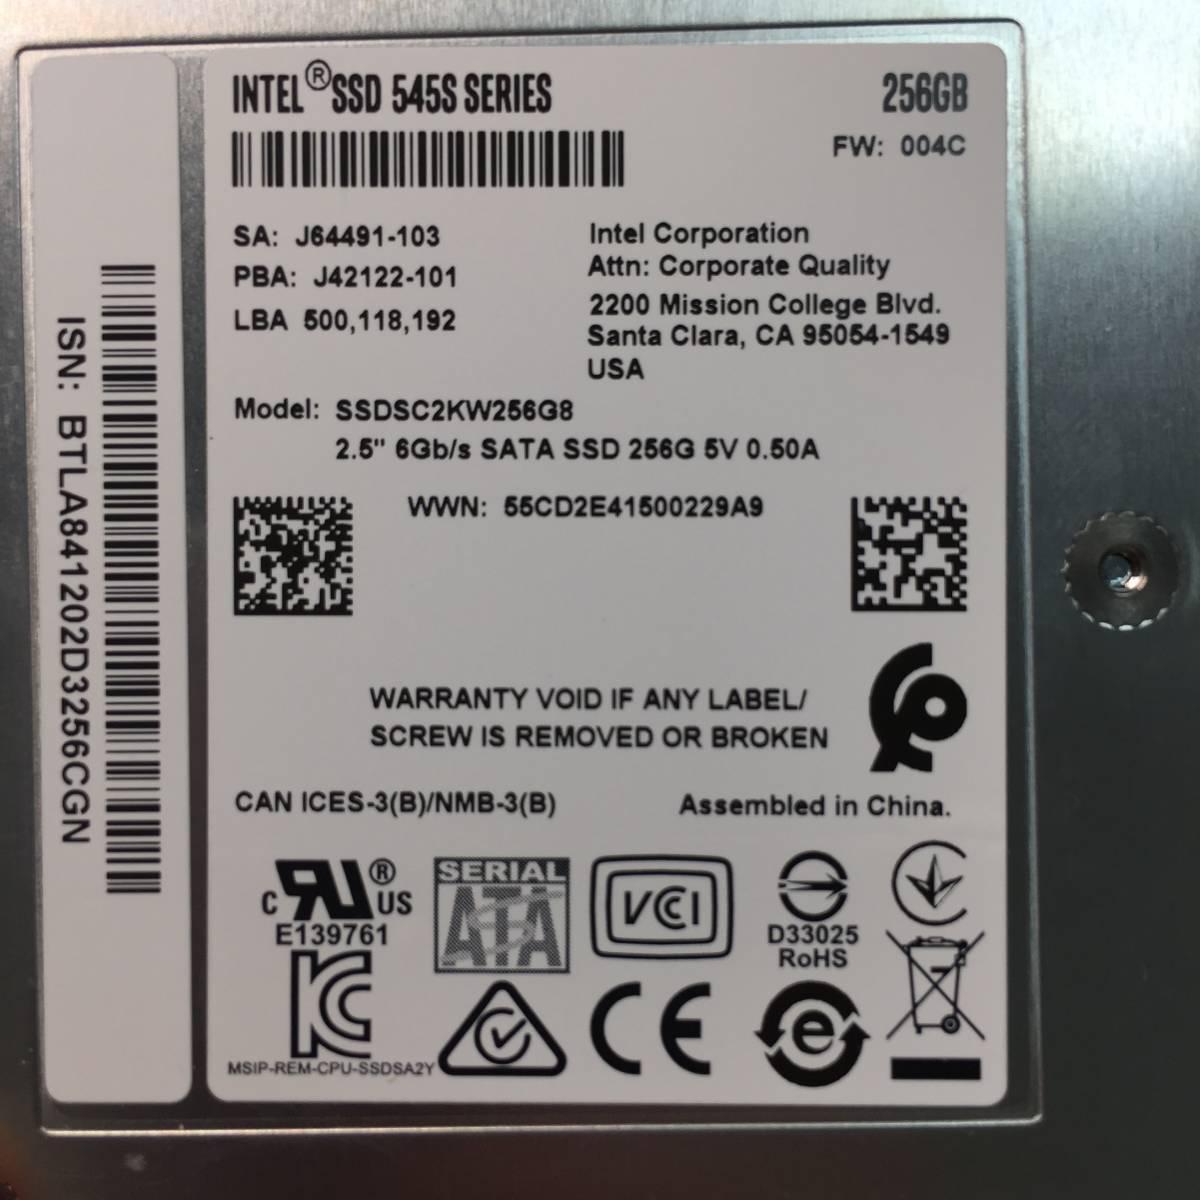 使用時間少 Intel 545s 256GB SSD SATA 64層 3D NAND 256GB _画像3